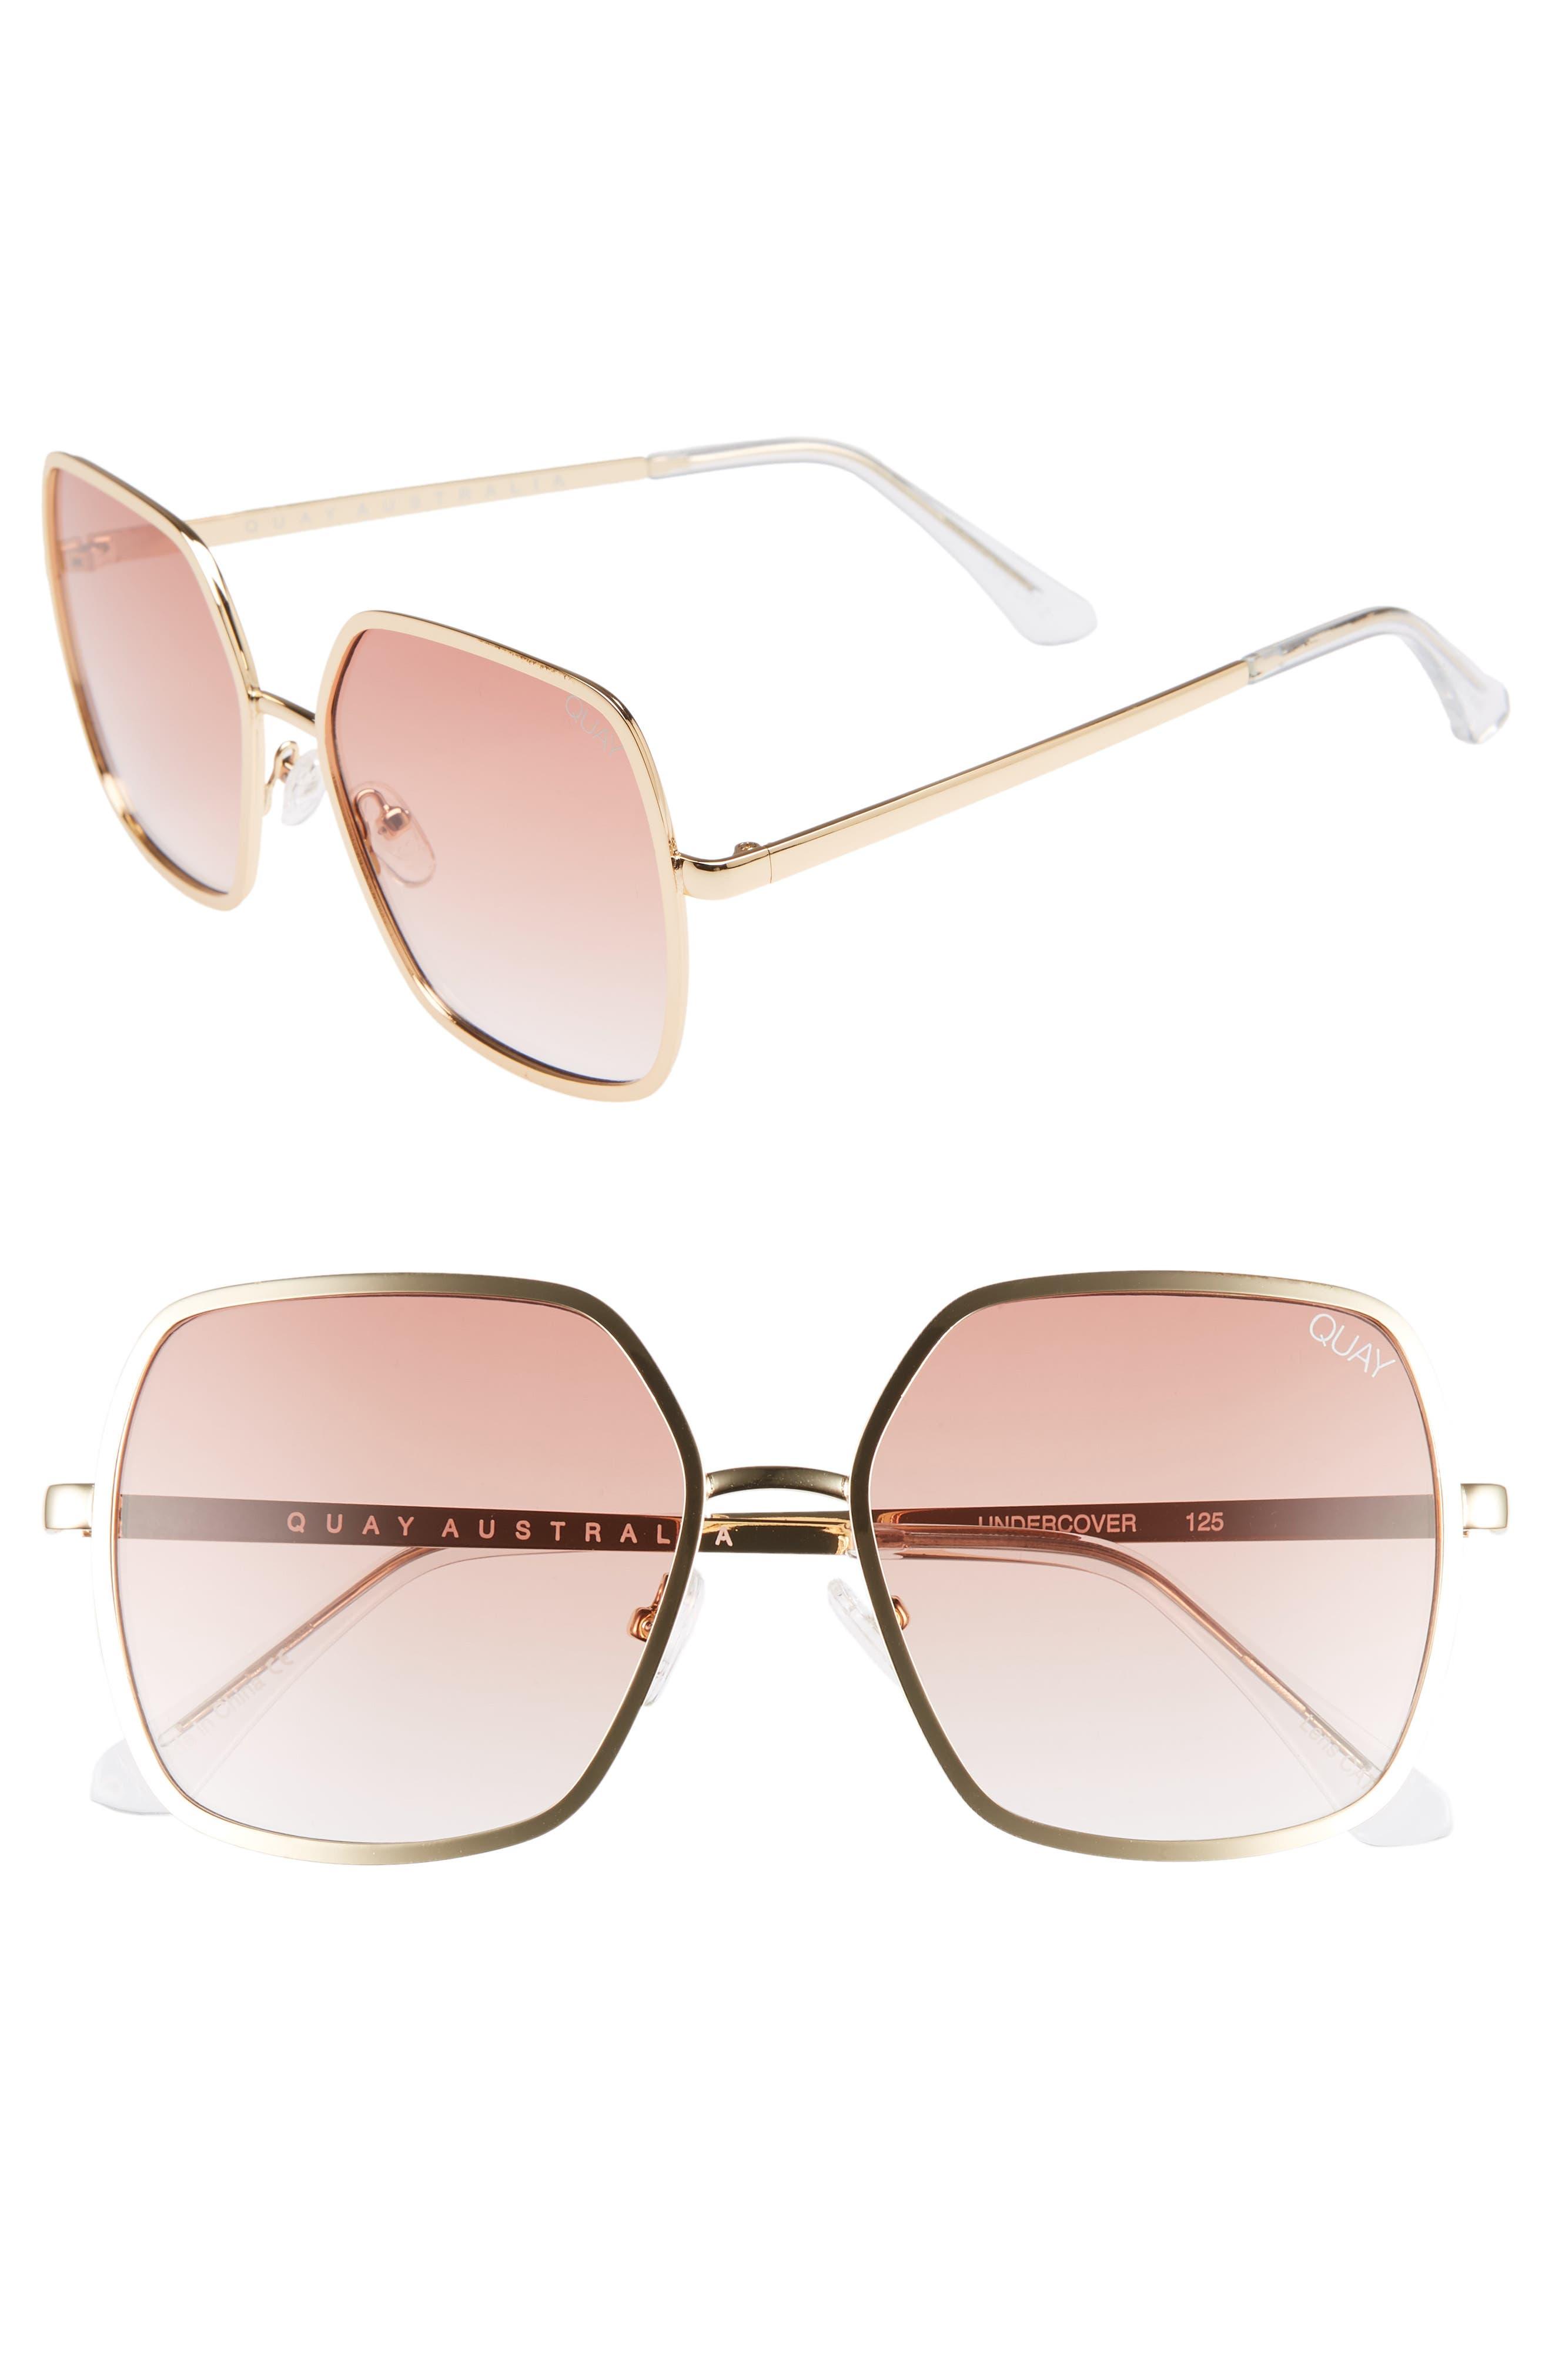 Quay Australia 57Mm Square Sunglasses - Gold/ Peach